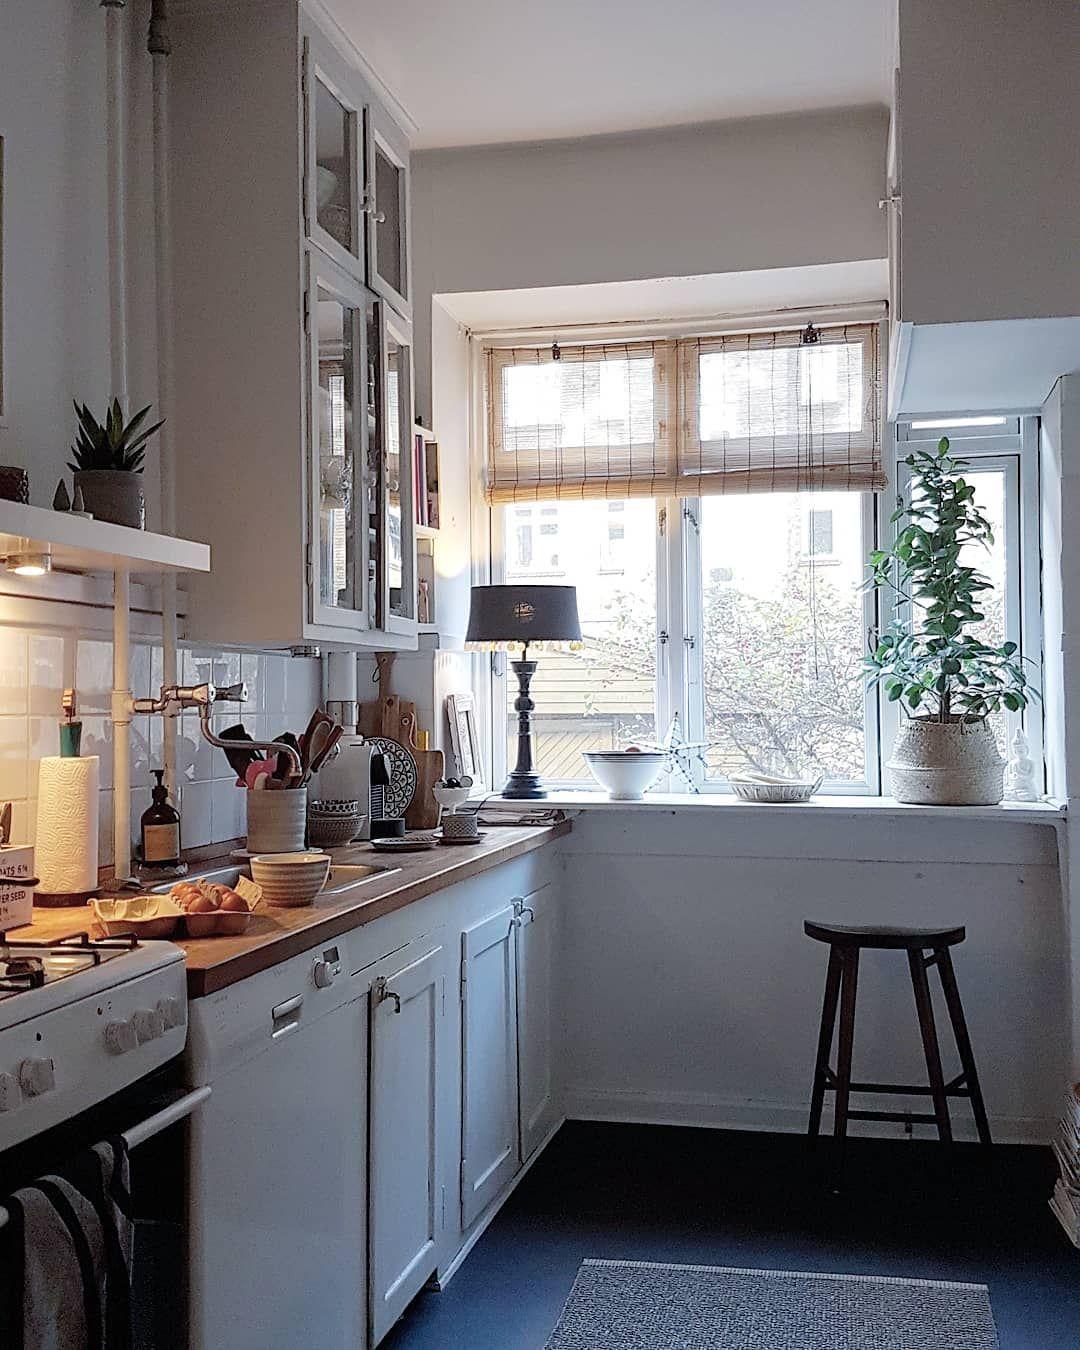 bohemian style kitchens design ideas interior design kitchen bohemian kitchen kitchen design on kitchen interior boho id=42150